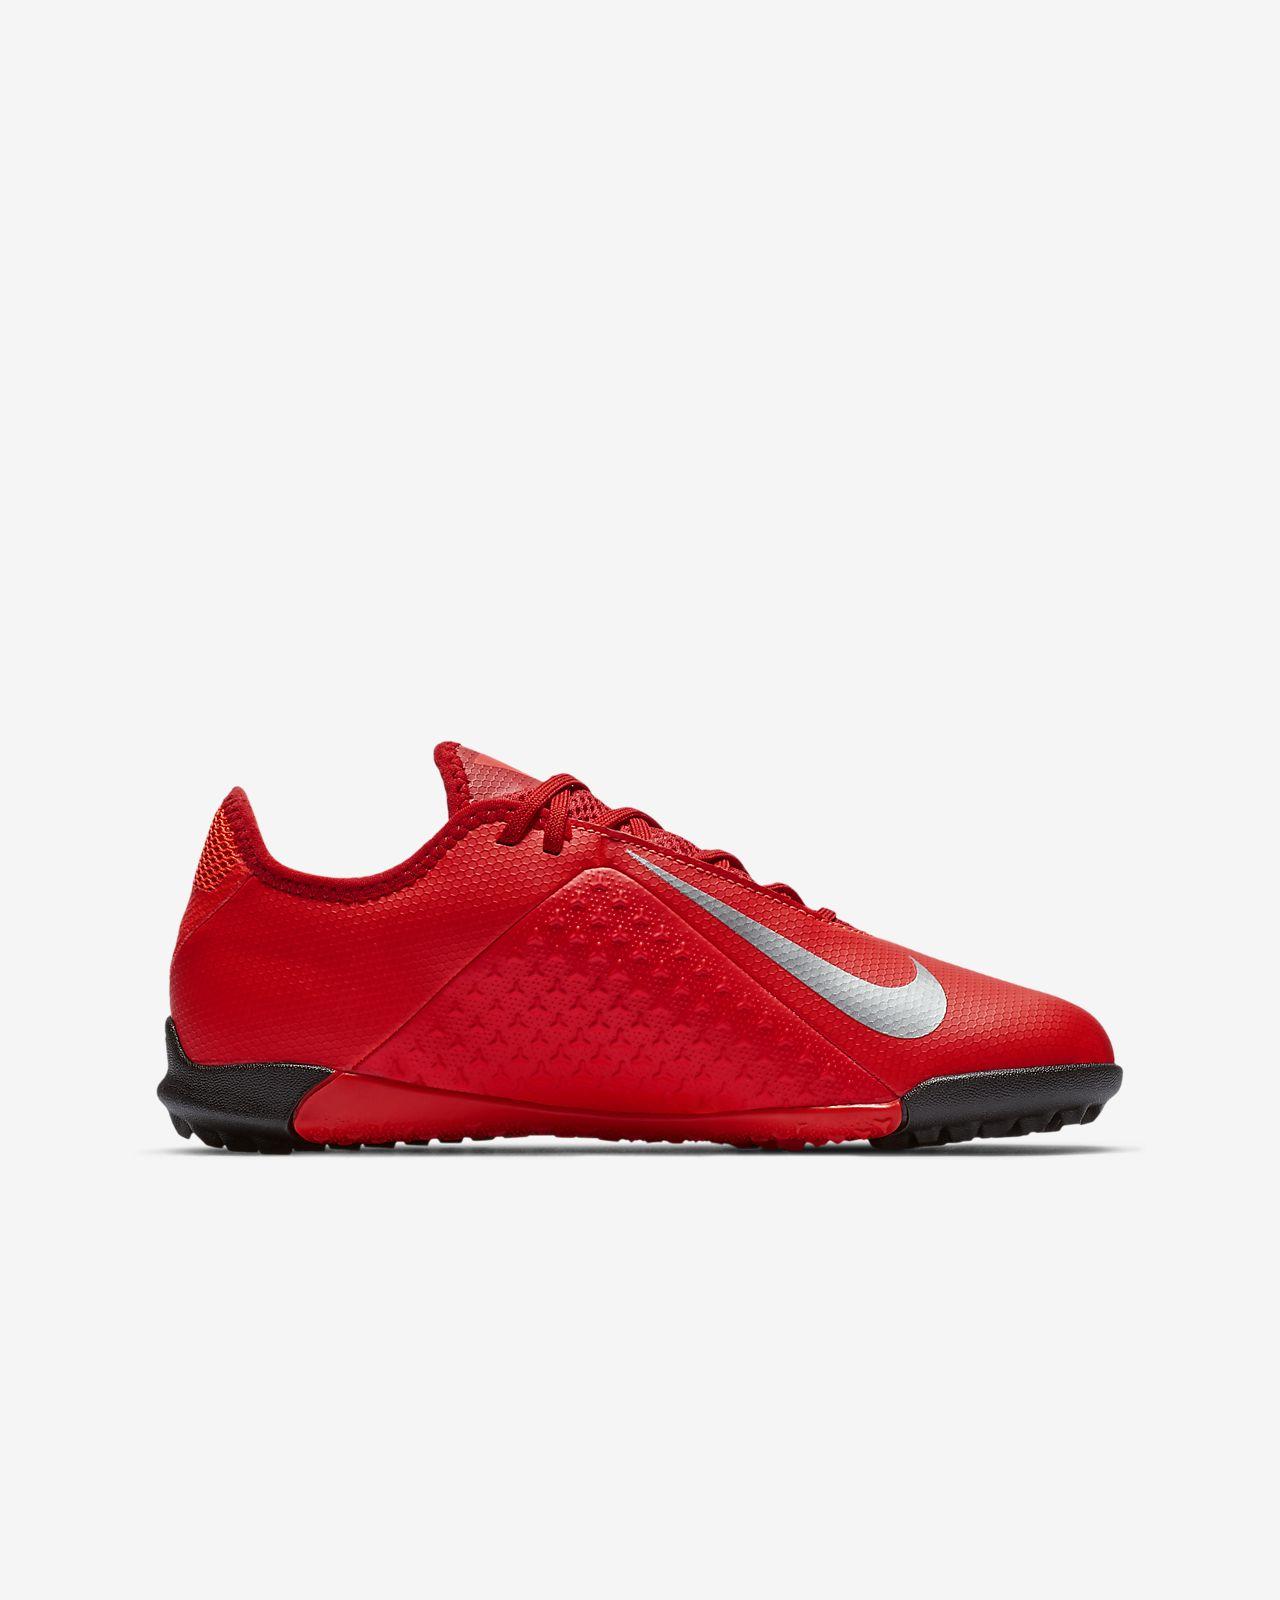 Jr De Synthétique Football Surface Chaussure Phantomvsn Pour Nike Rdw4FY